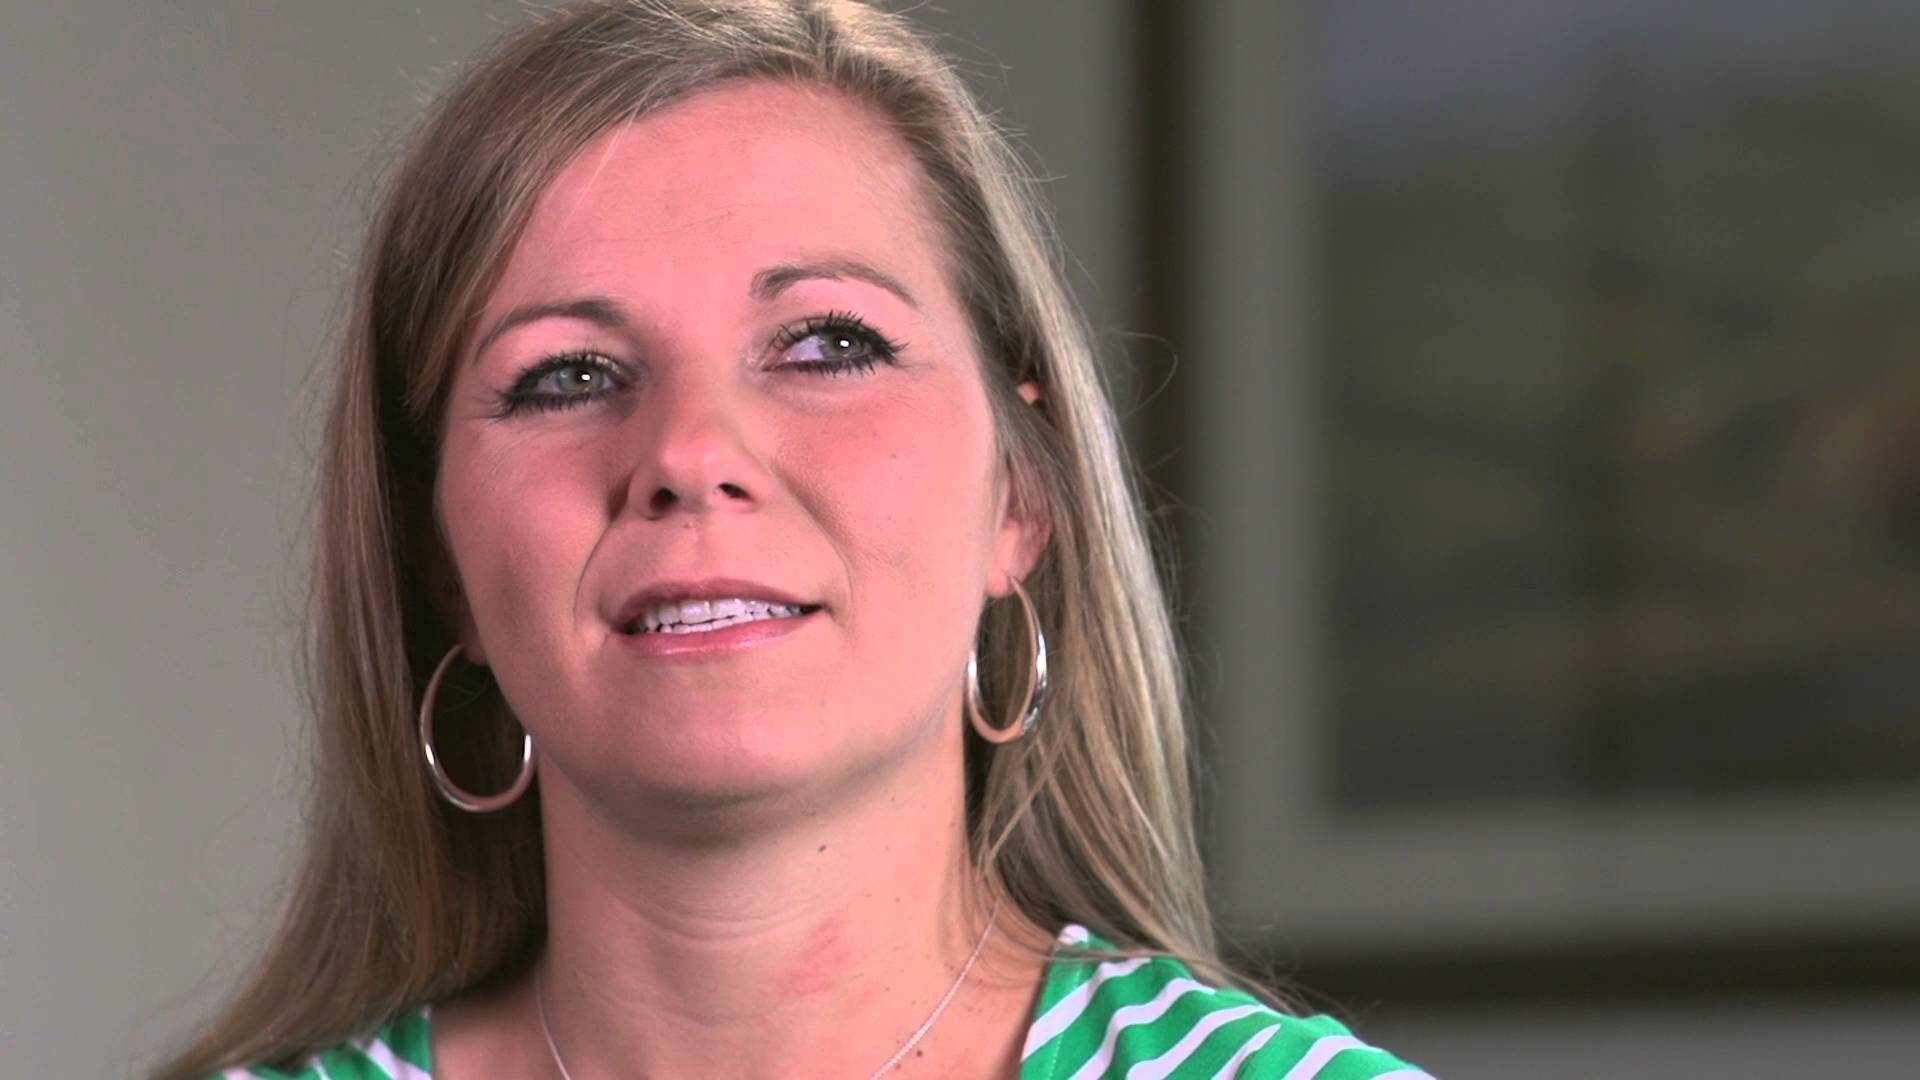 Cerner Maternity Solutions